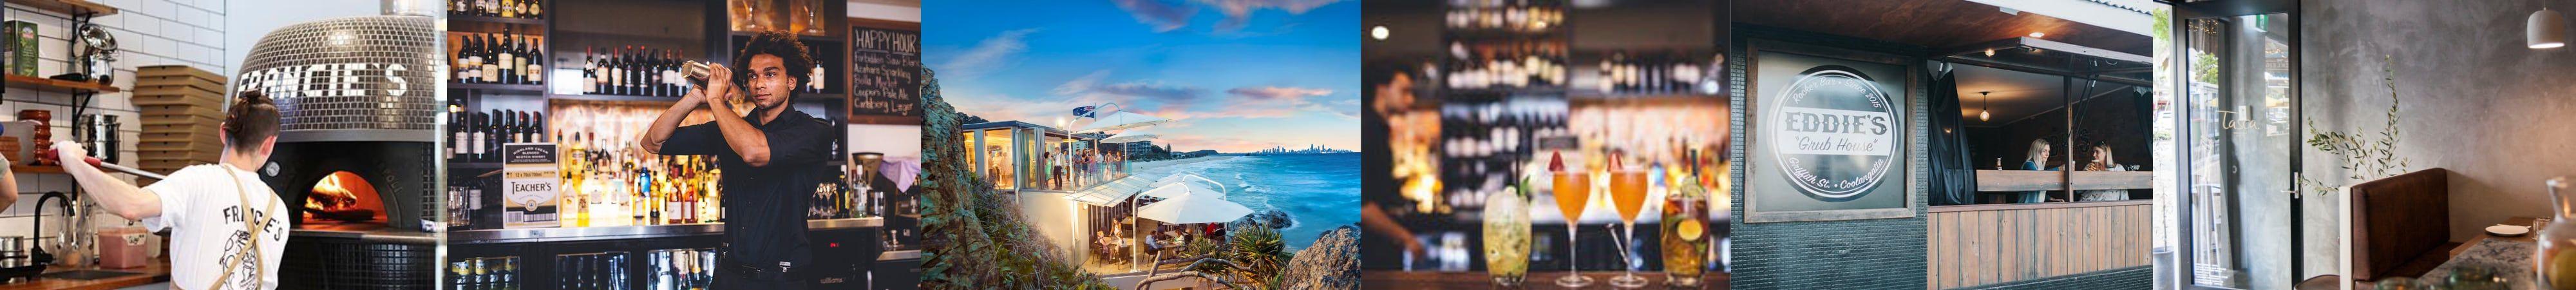 Gold Coast Restaurants